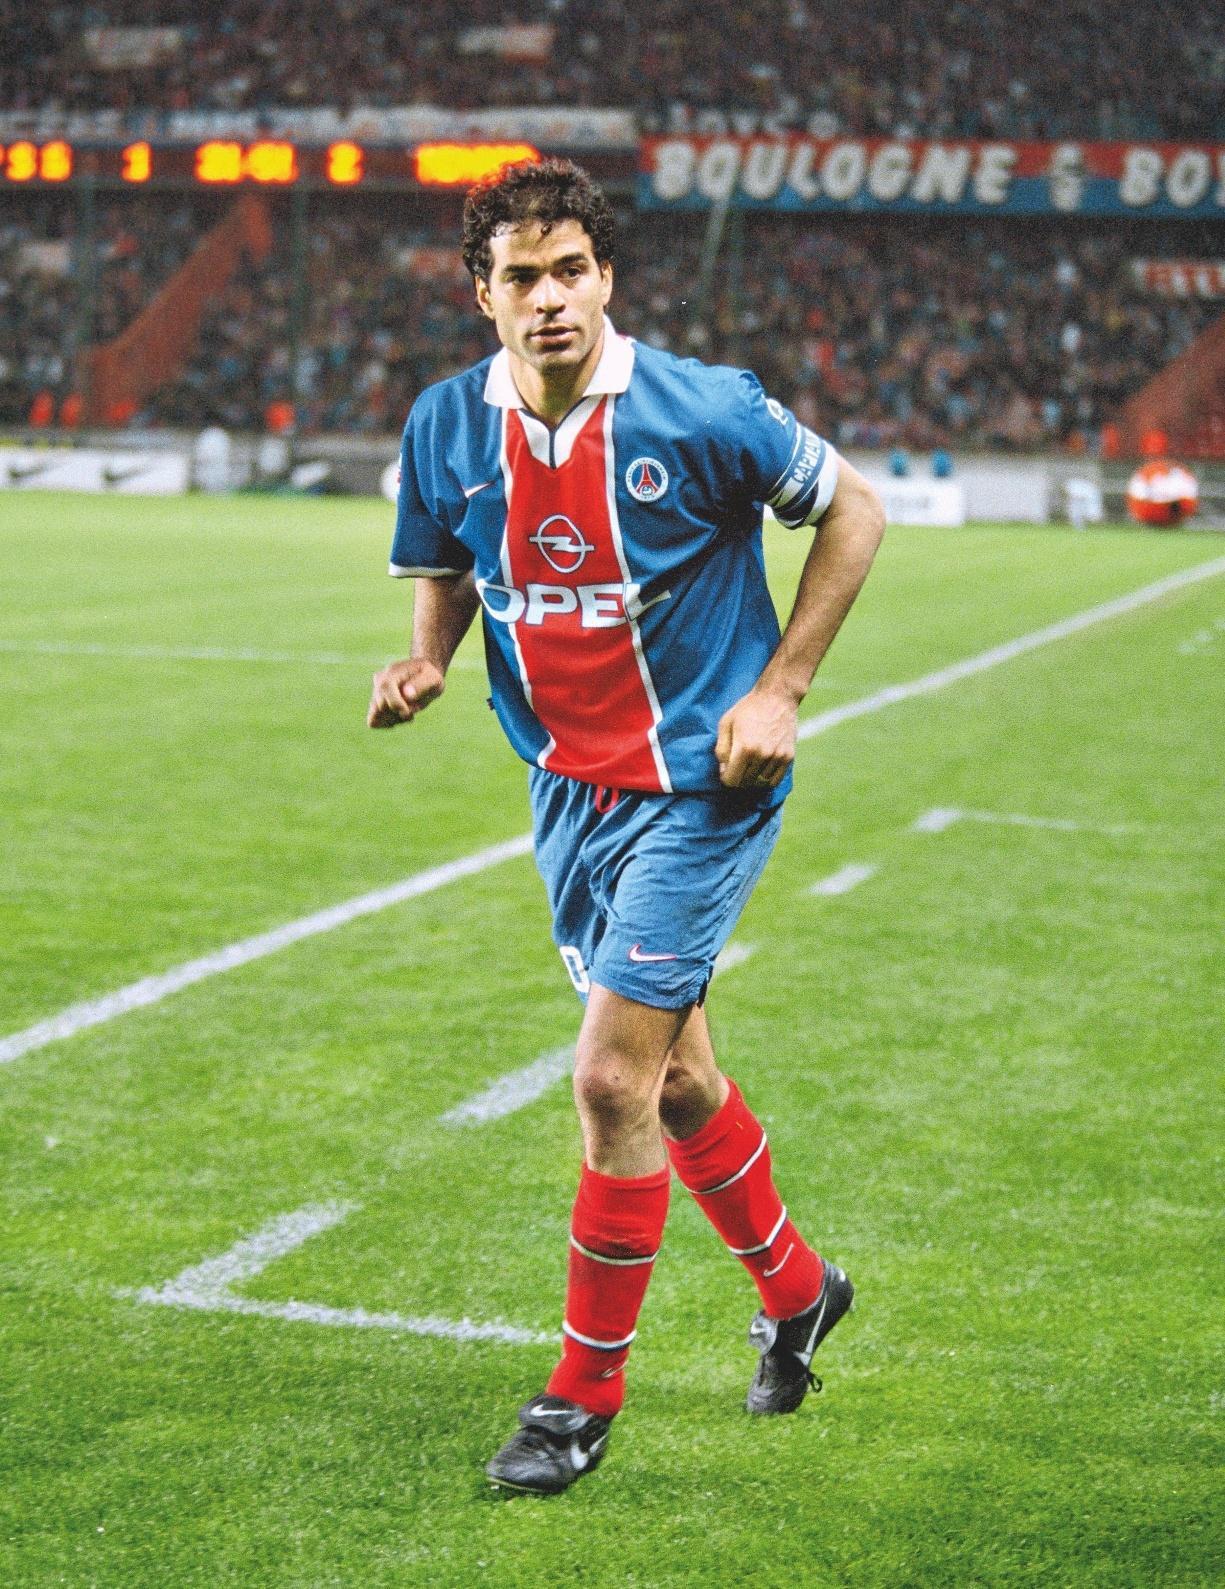 Christophe Larcher